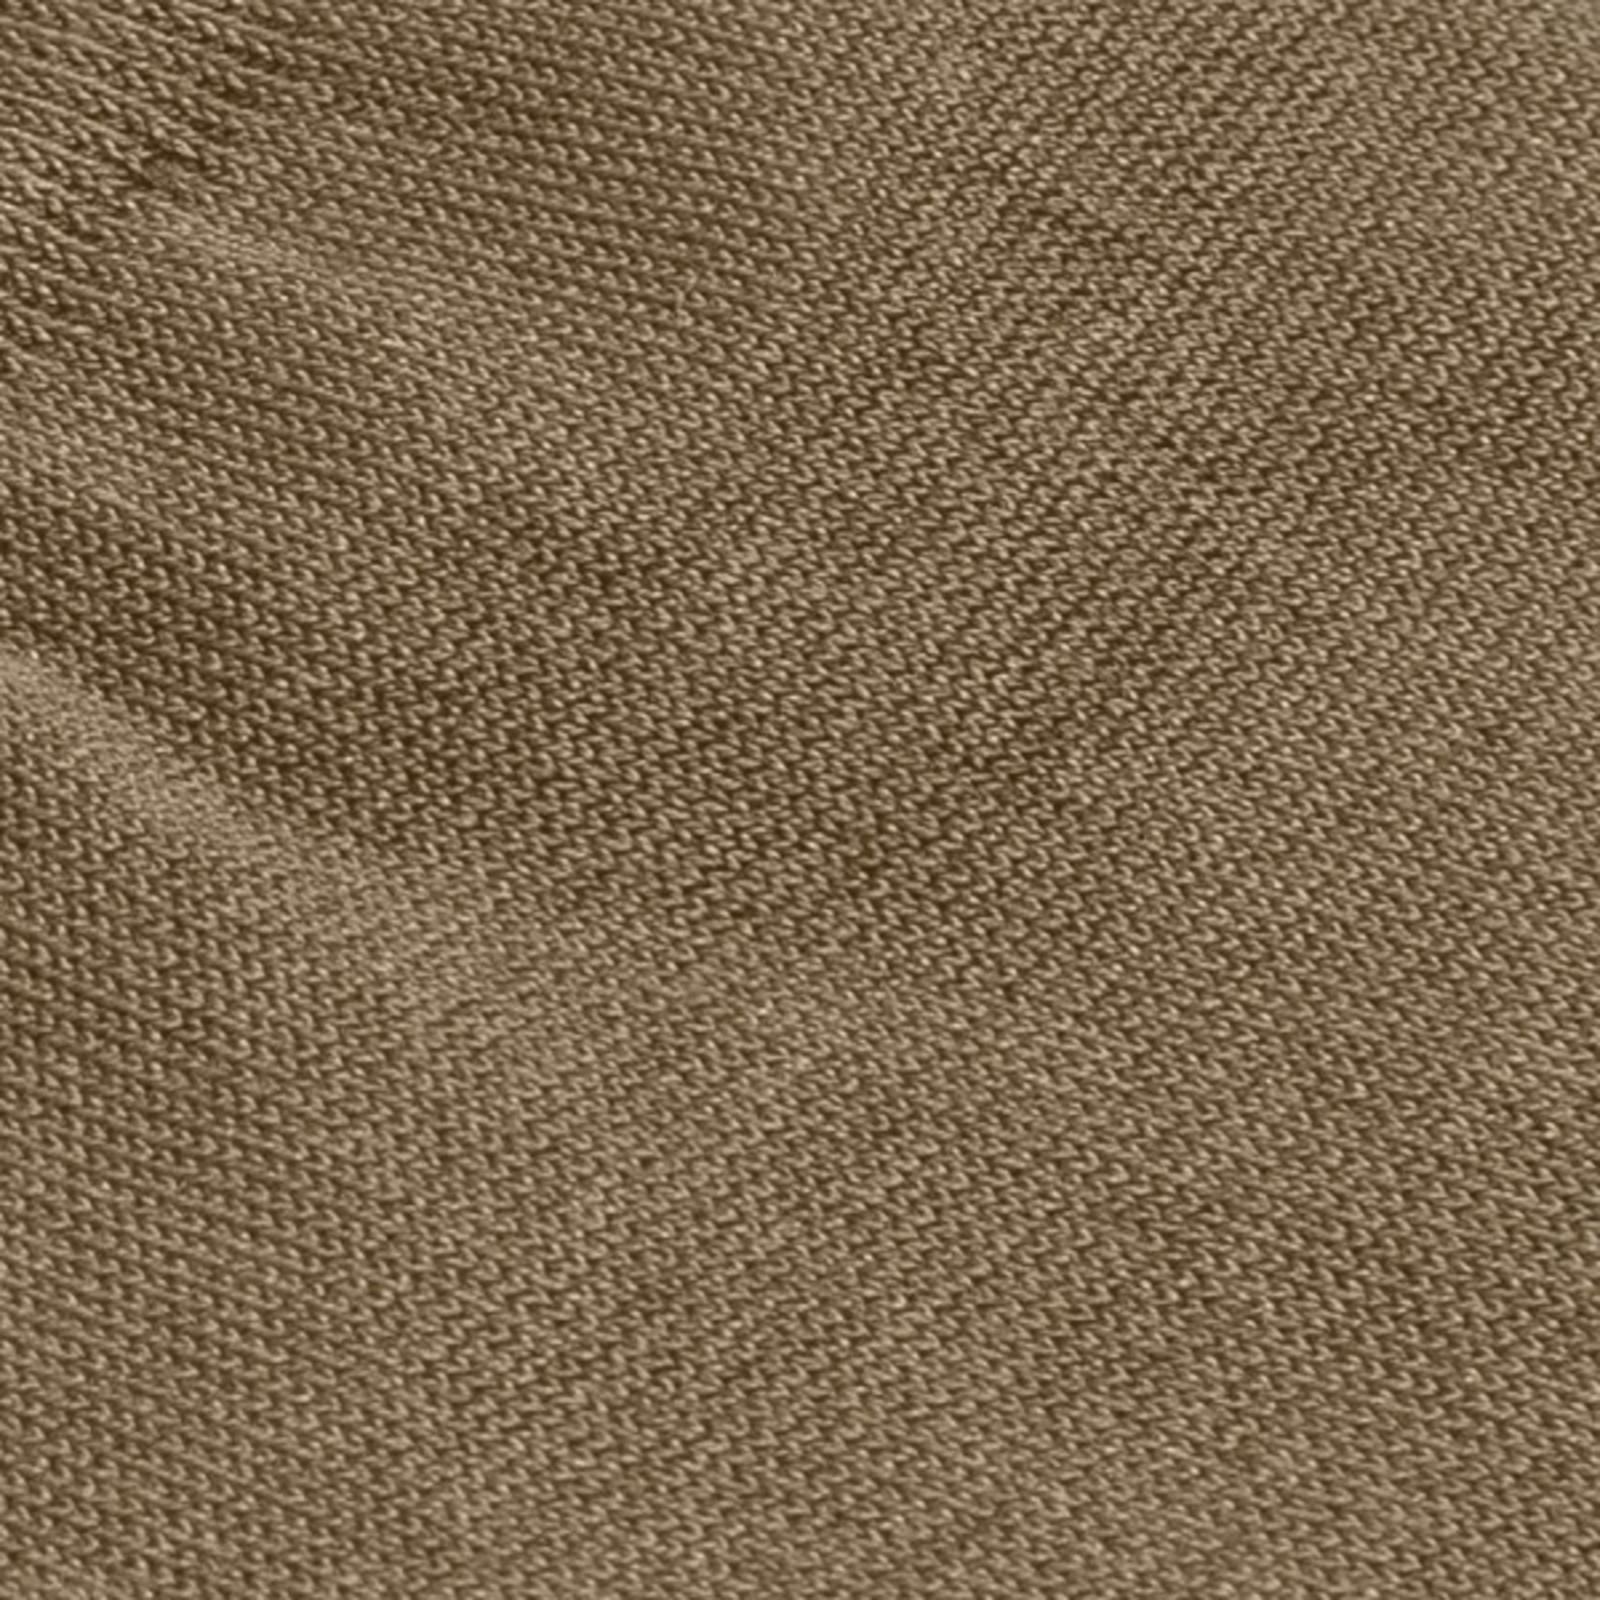 Carlo Lanza Camel socks cotton